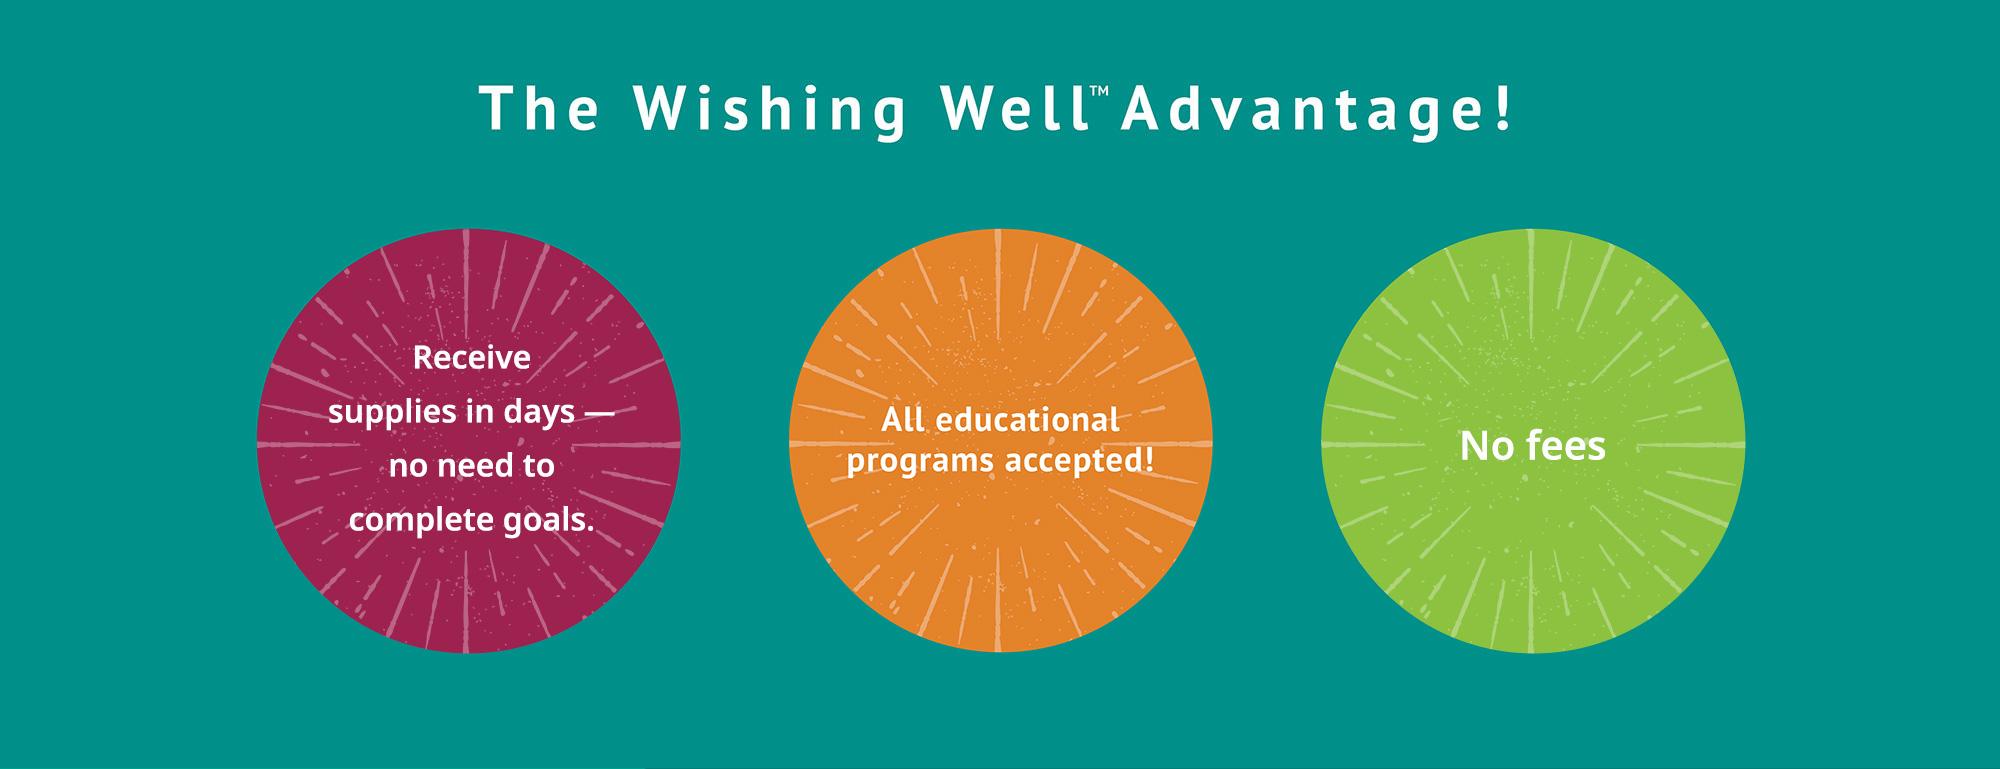 The Wishing Well Advantage